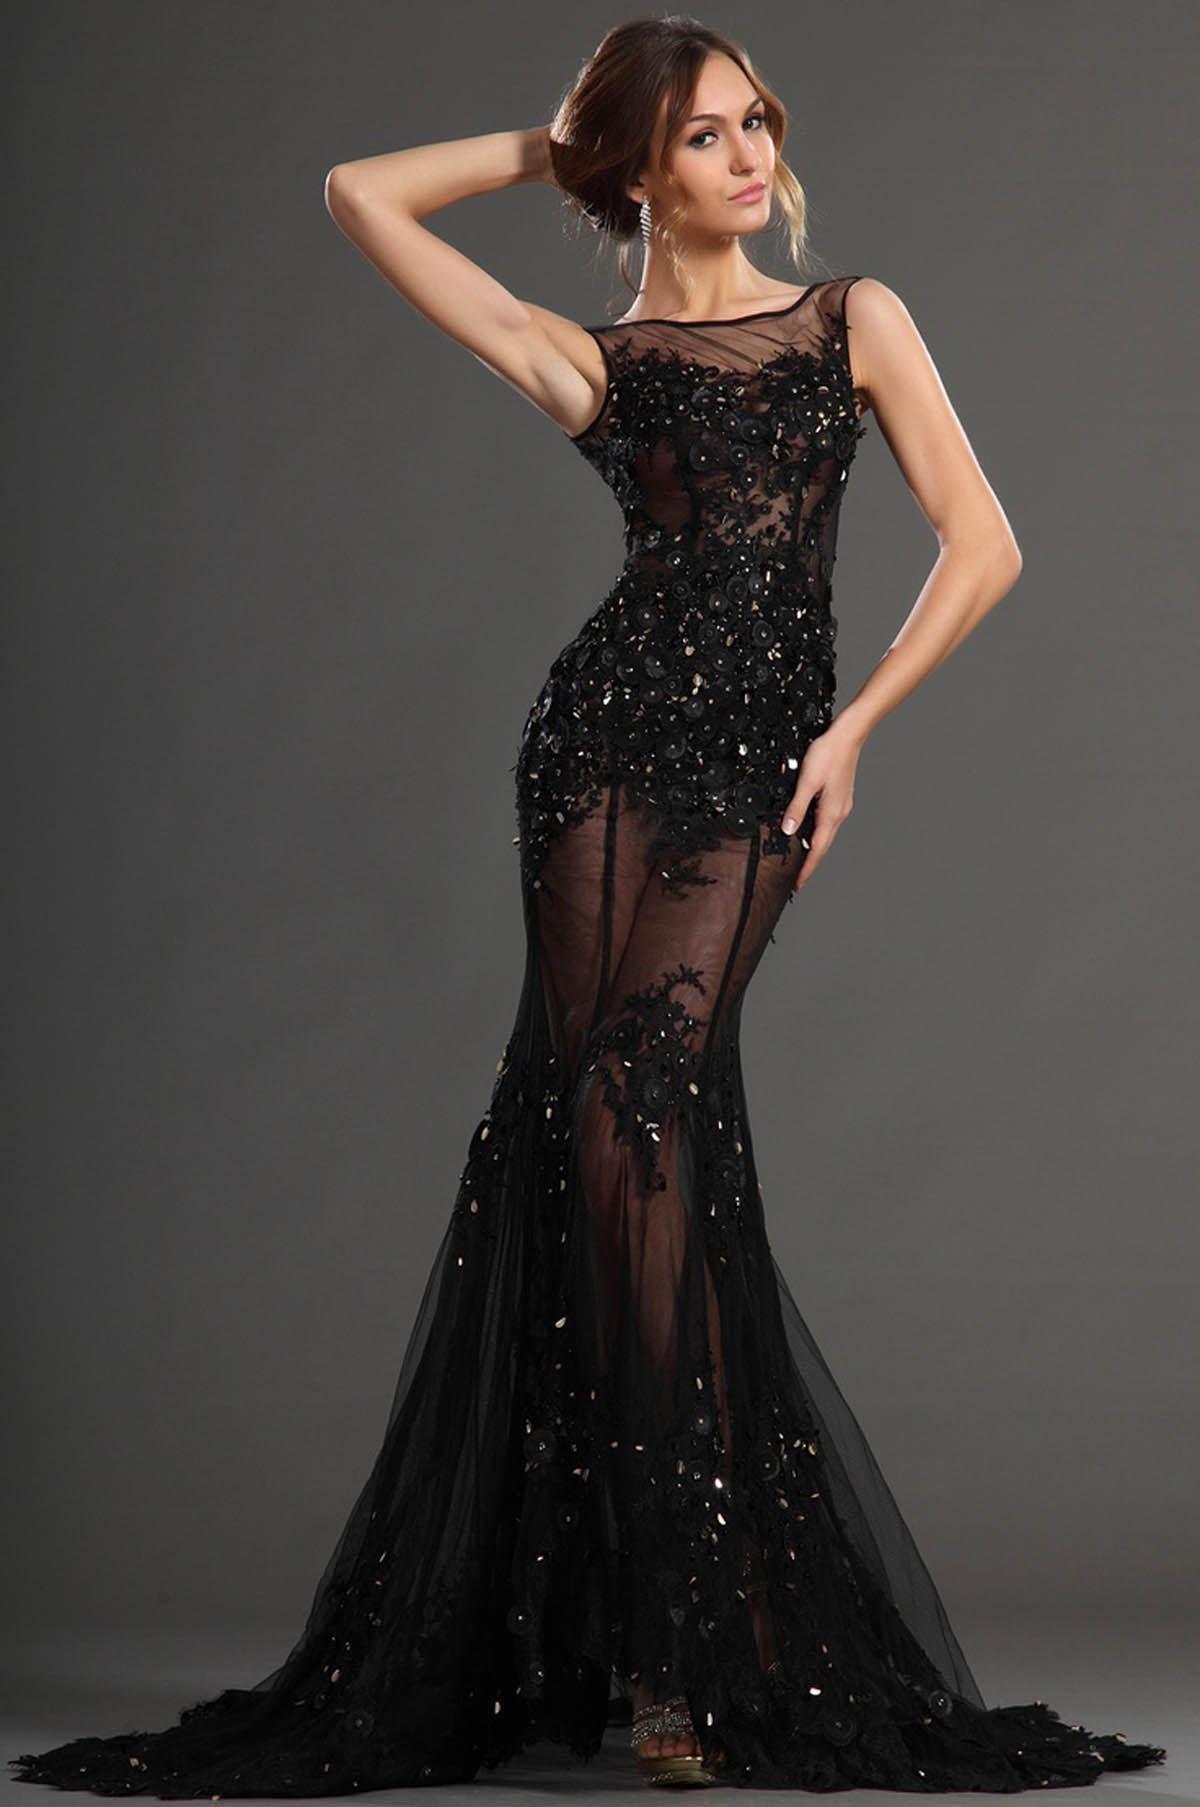 Вечерние платья в стиле рыбка